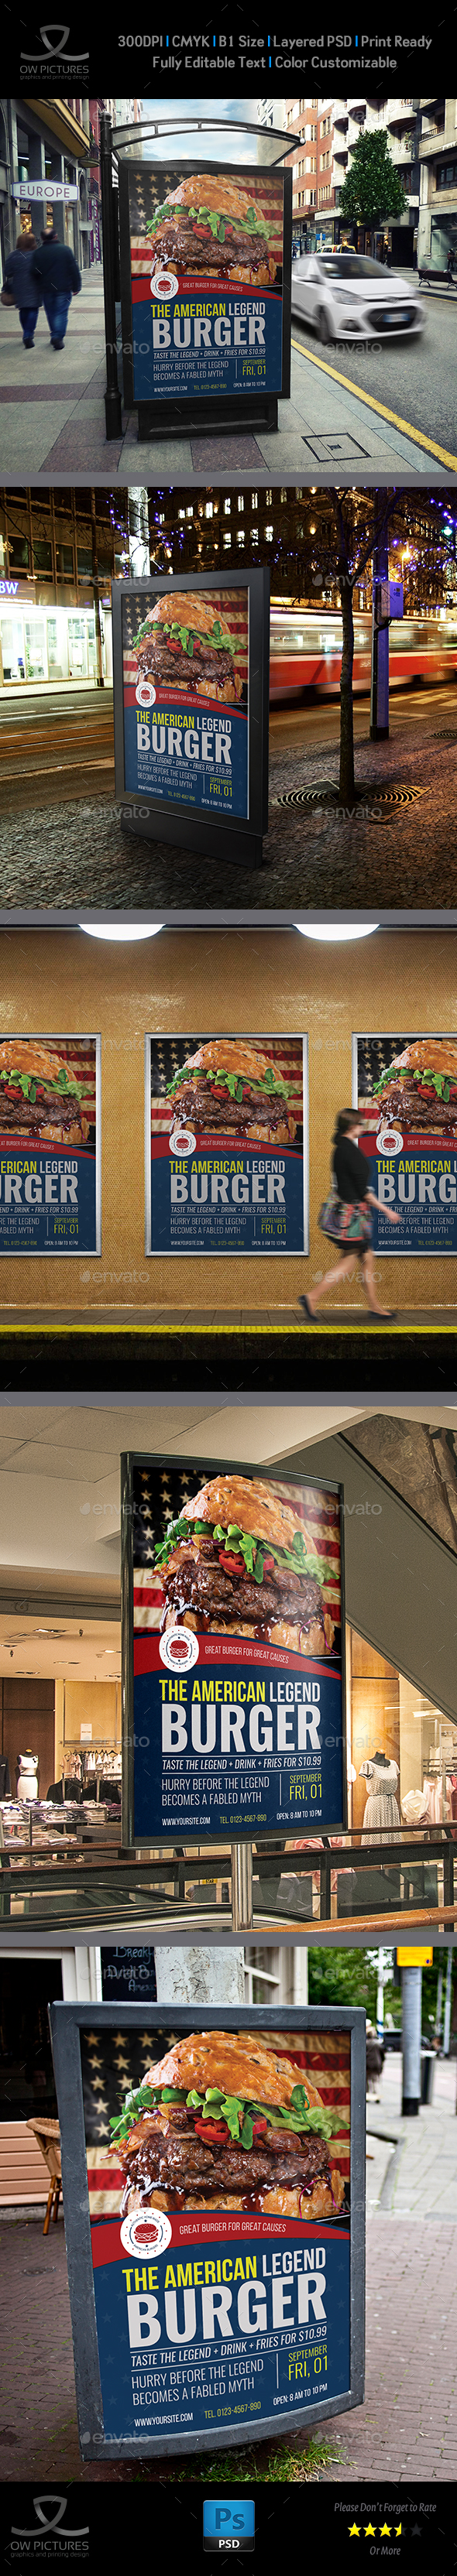 Burger Restaurant Poster Template Vol.5